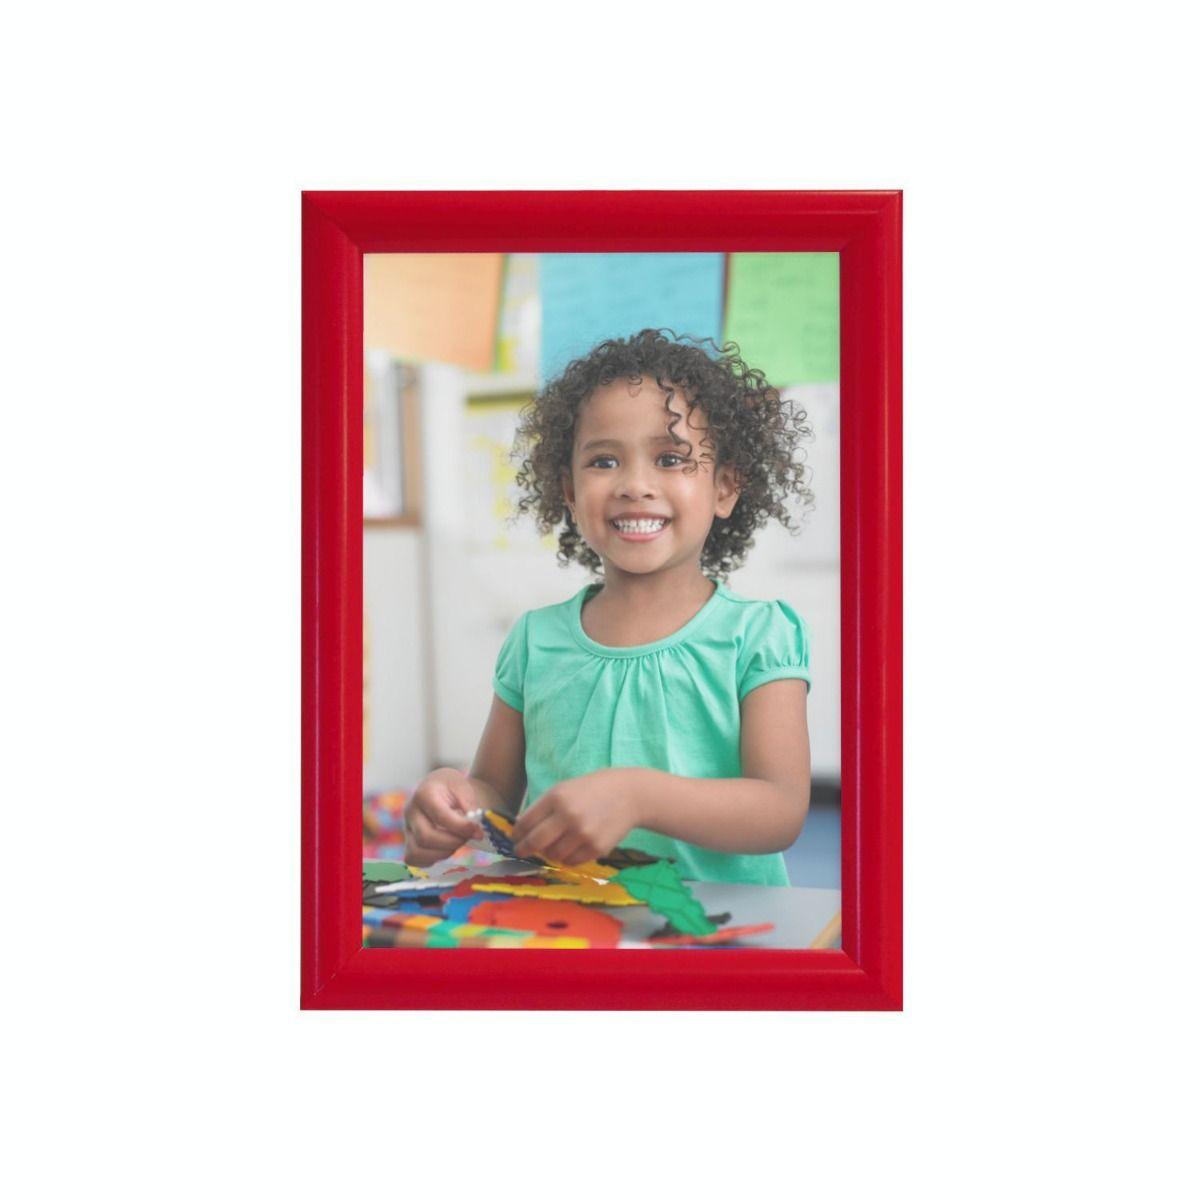 Sign Holders | Red snap frames